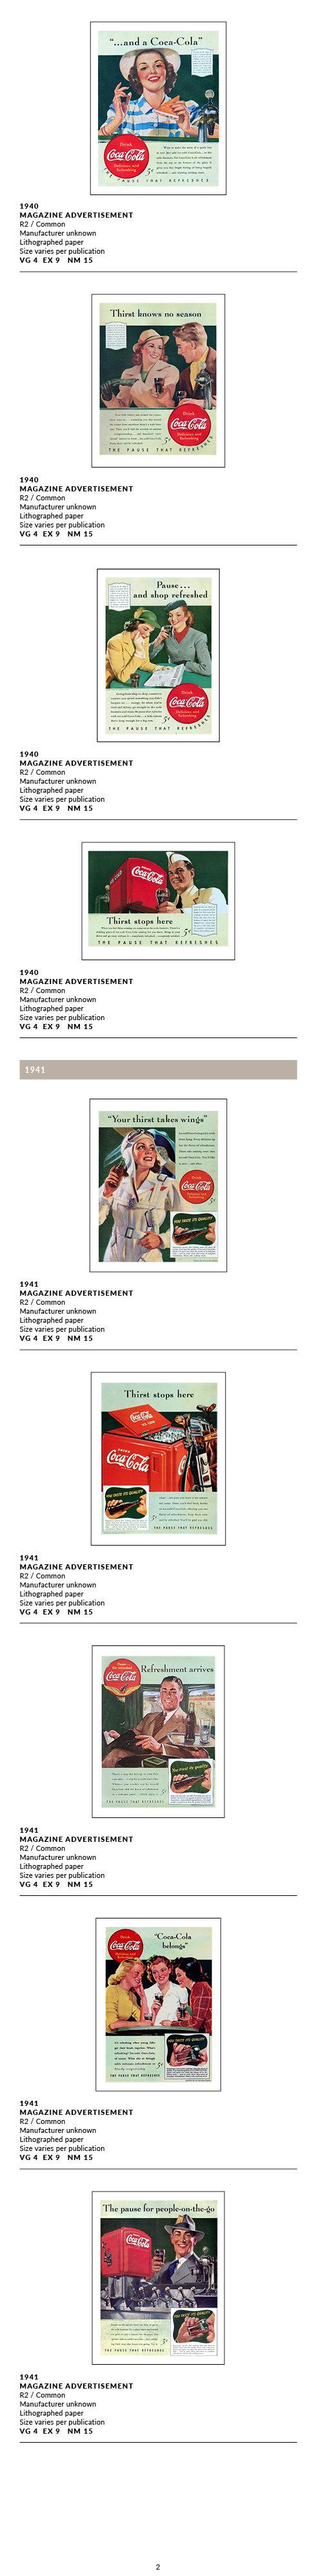 1940-45 Ads_2.jpg